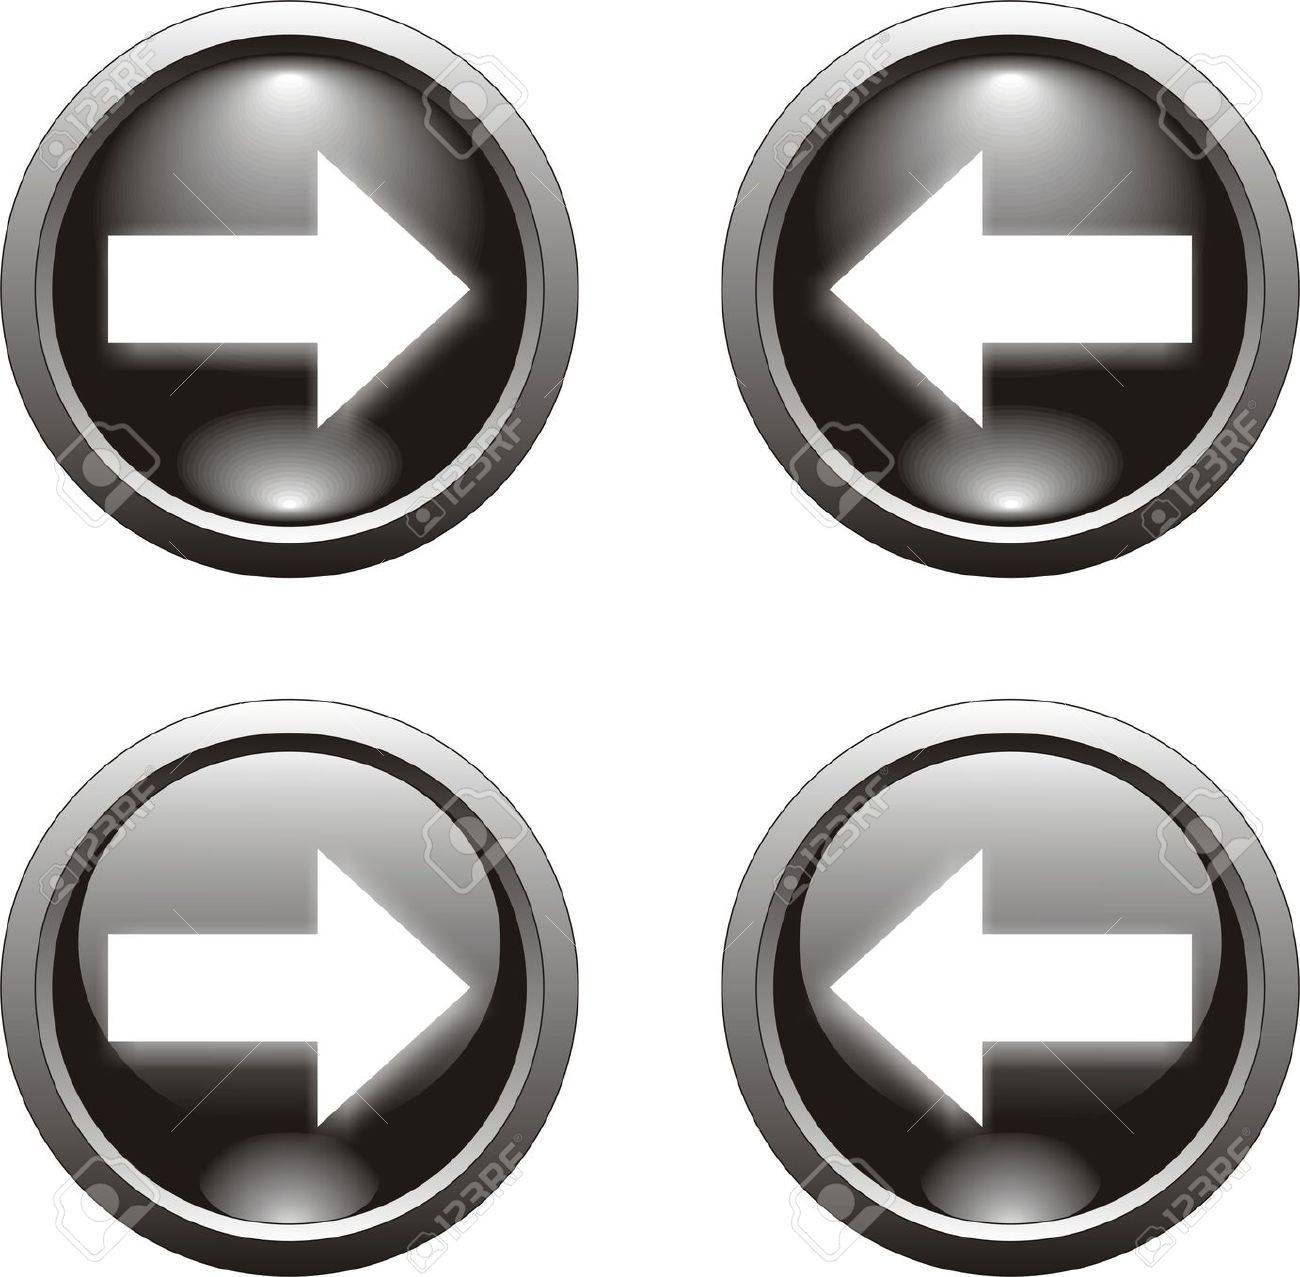 black arrow button - 8737436